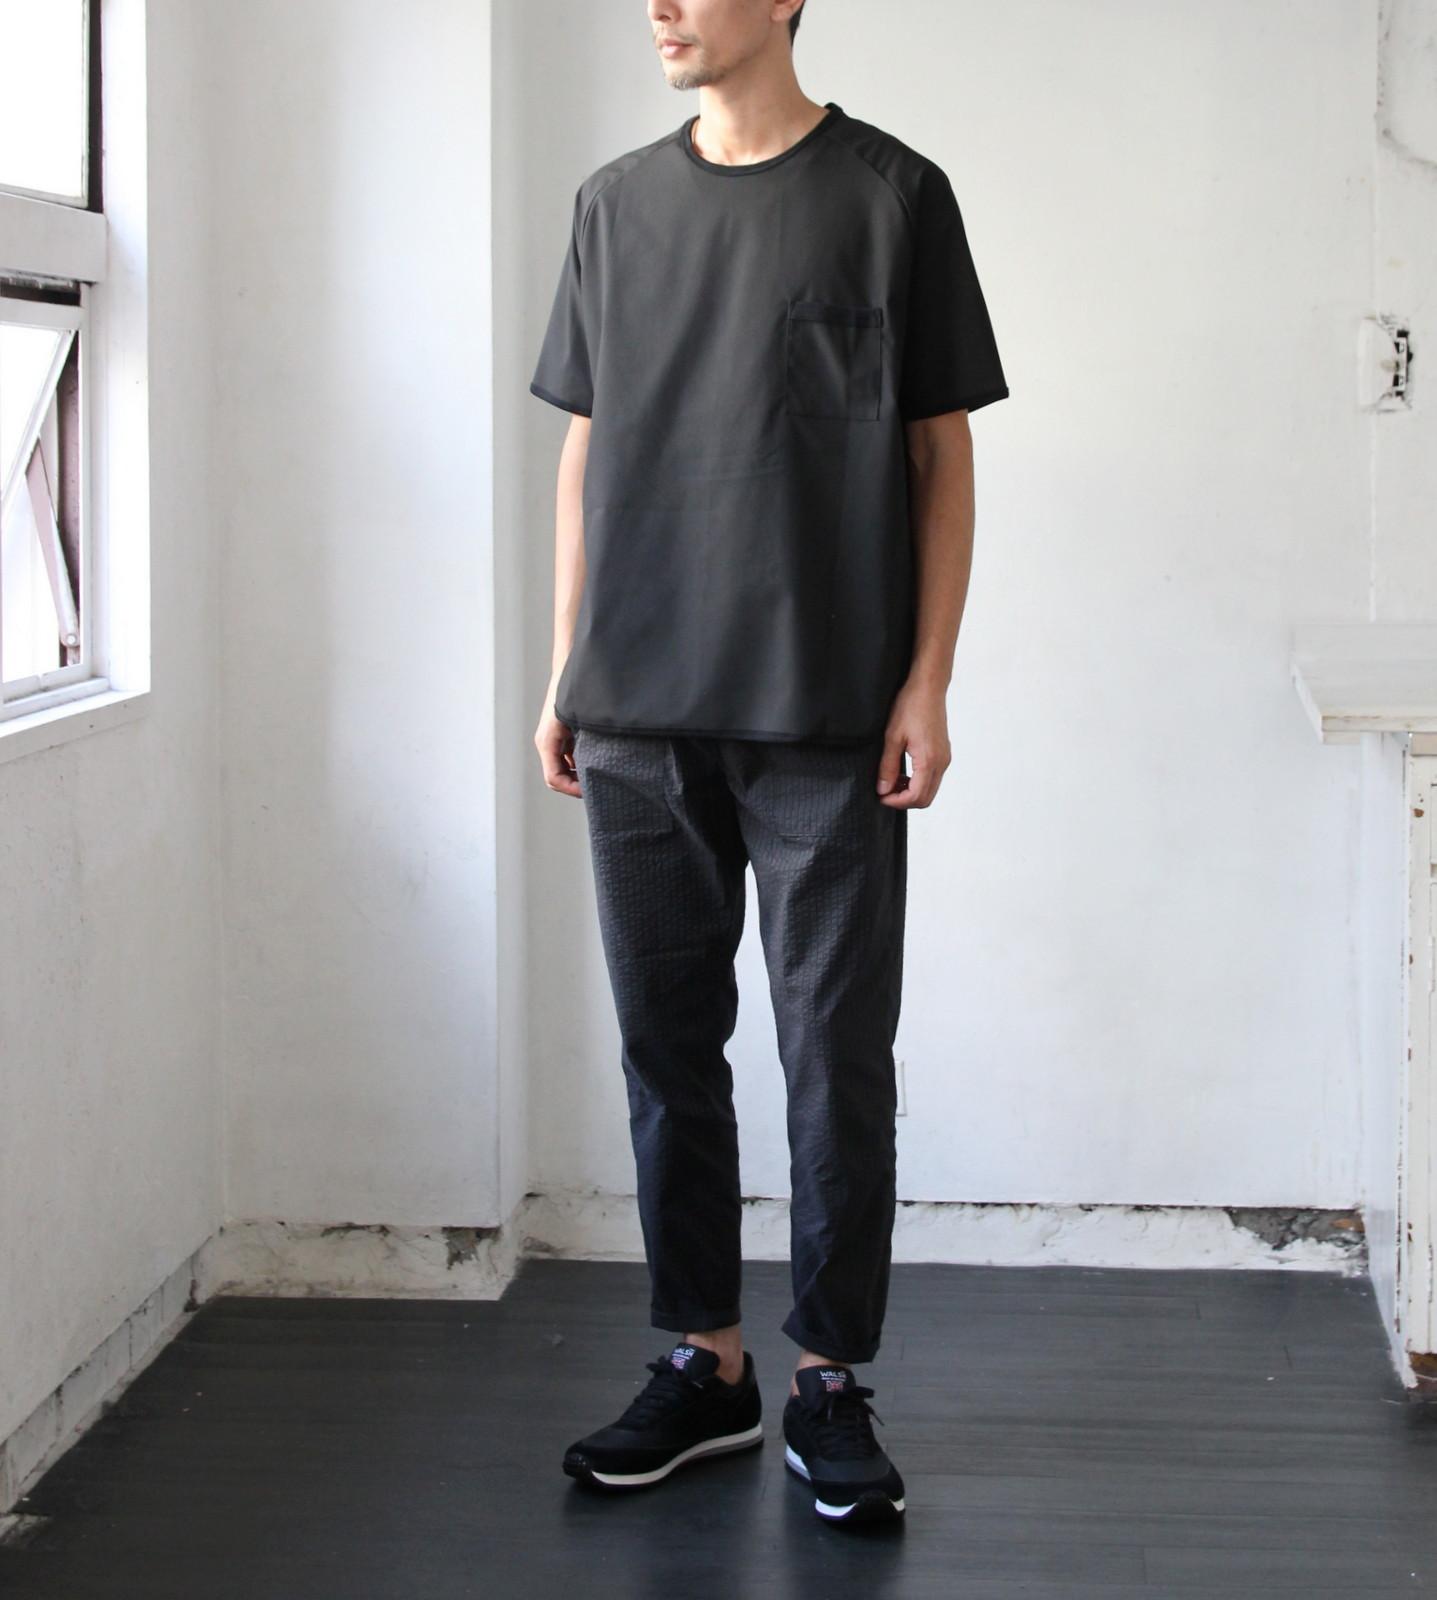 Tro Cool T-shirt_c0379477_20193195.jpg